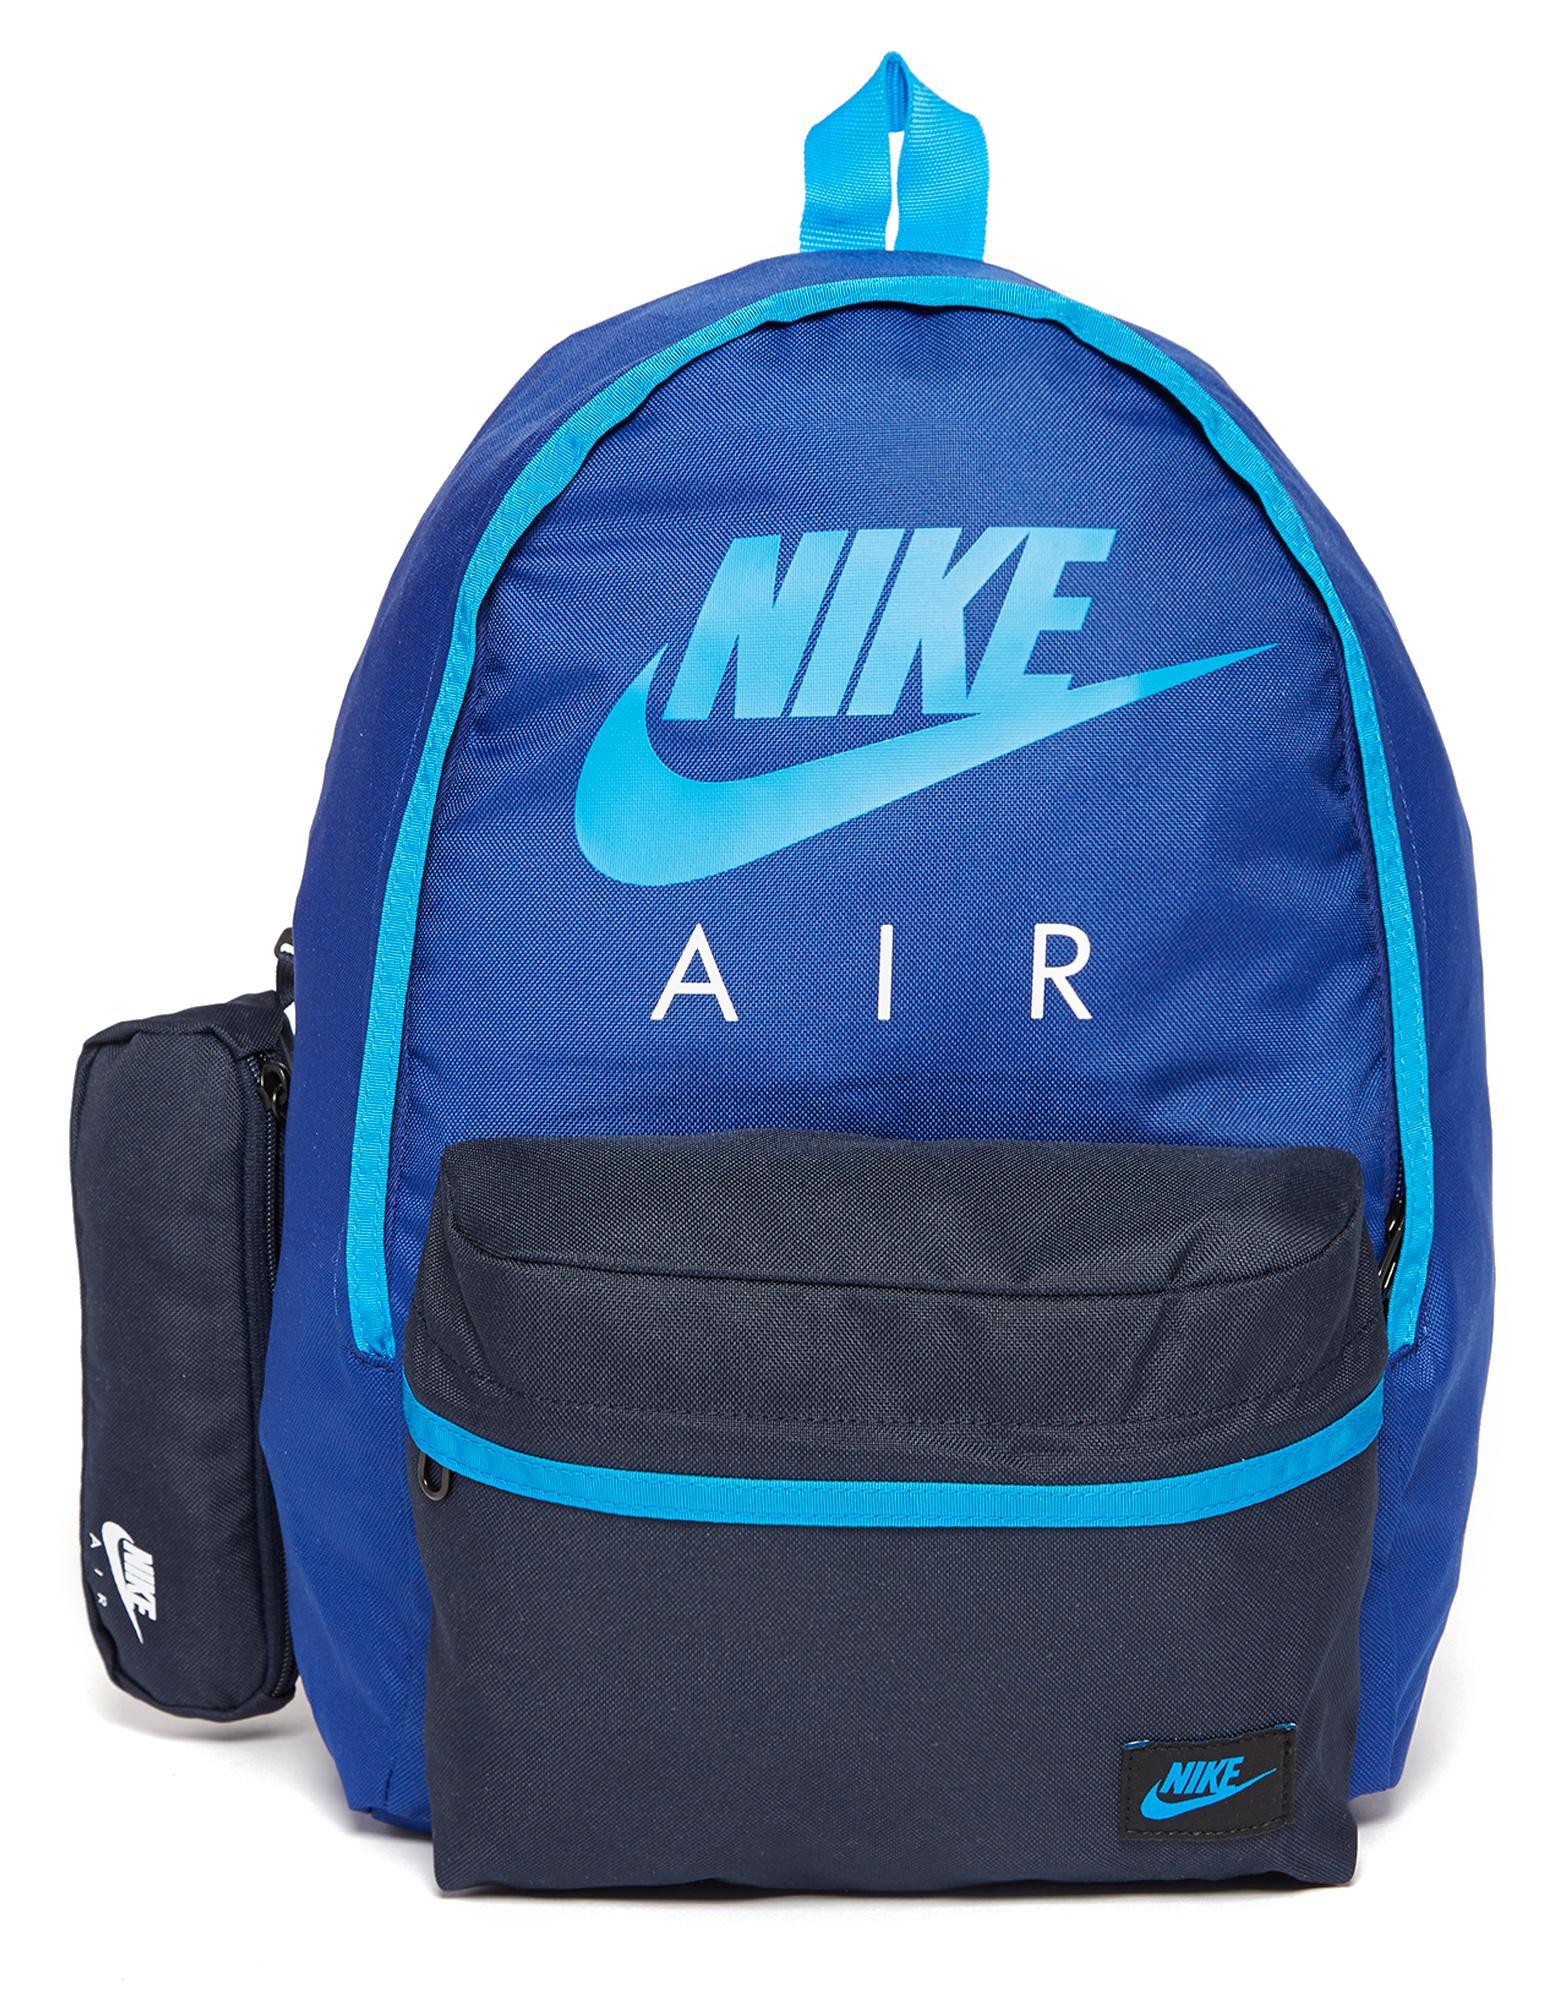 Nike Air School Bags For Boys 1500a2c6c8